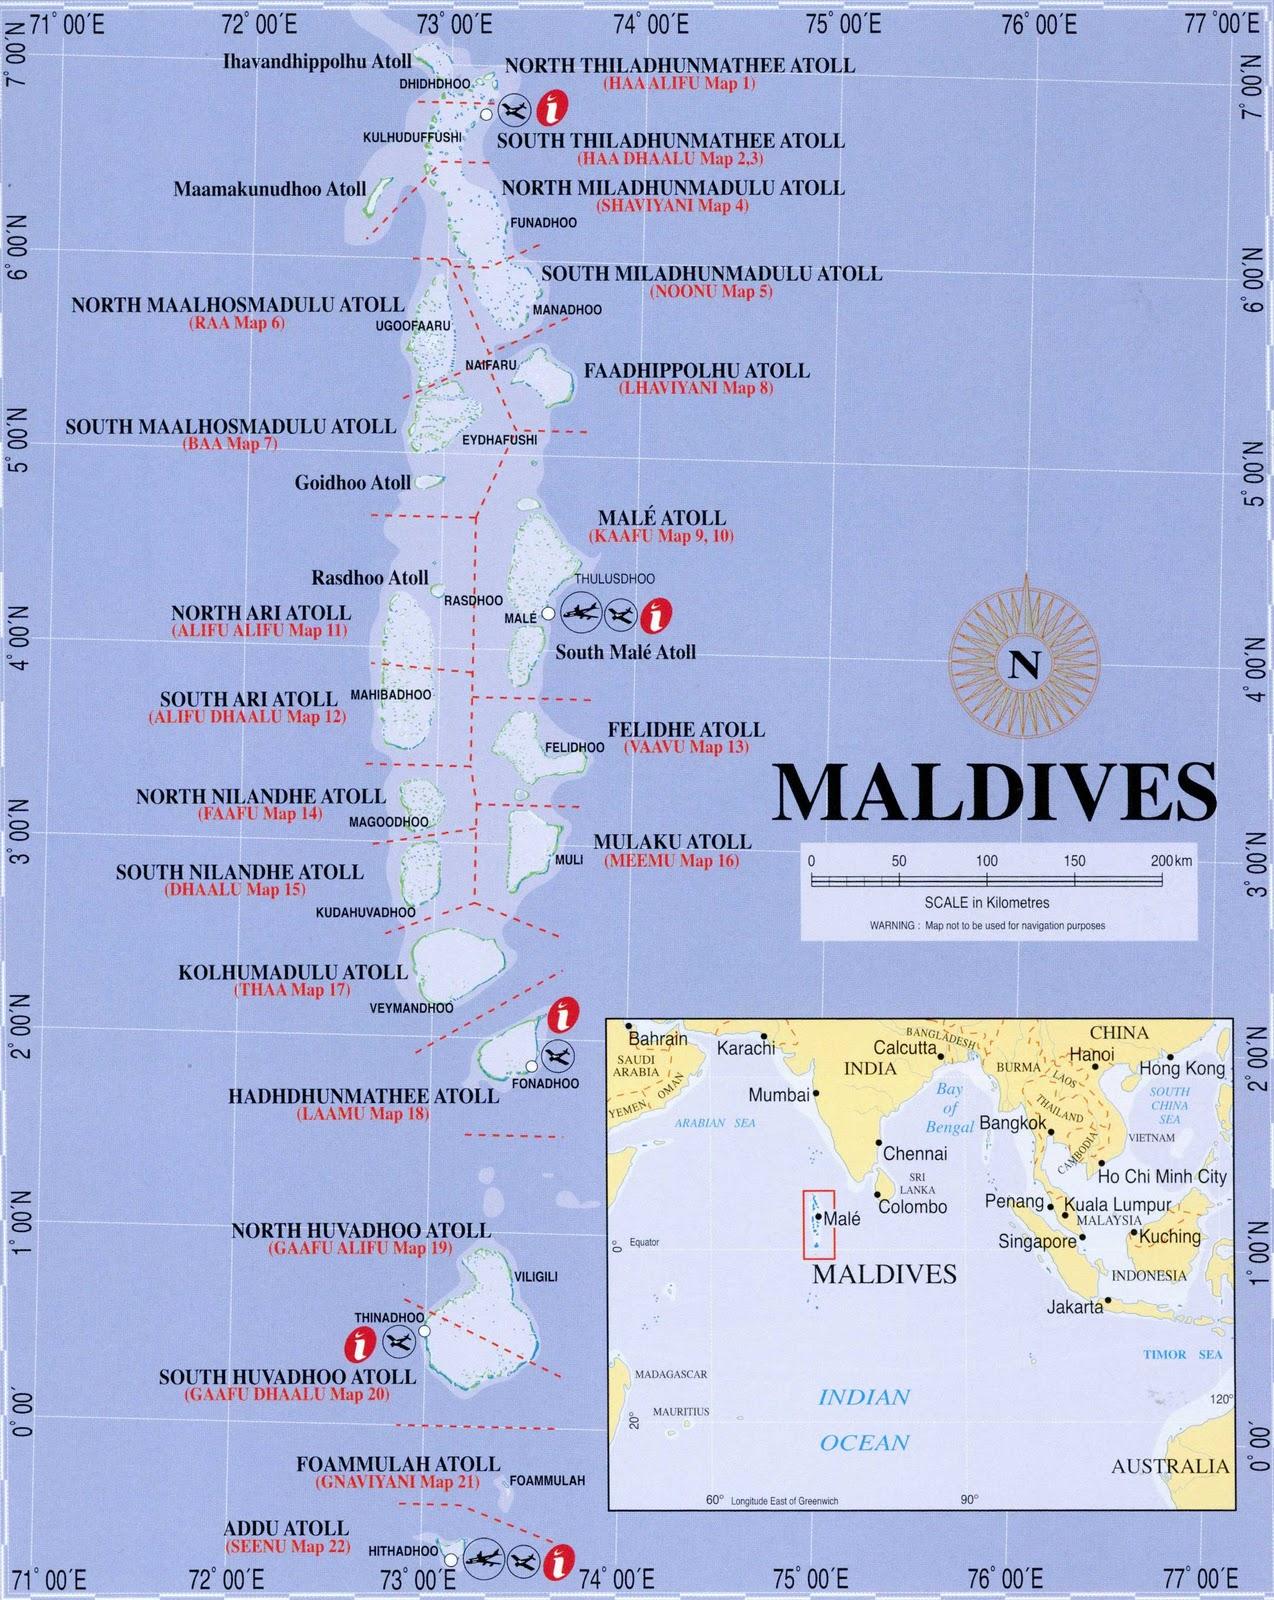 Maps of Maldives December 2010